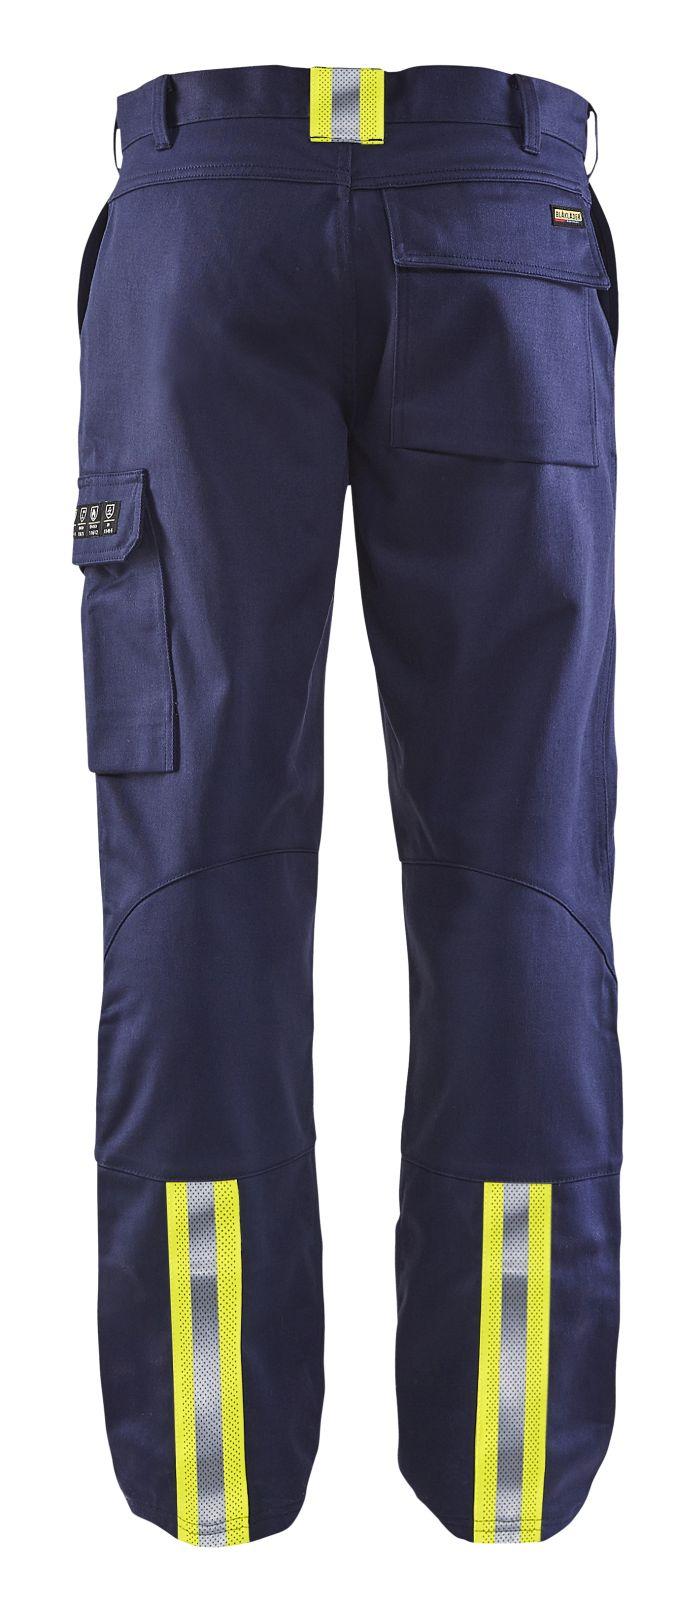 Blaklader Lasbroeken 17011501 Vlamvertragend marineblauw-geel(8933)